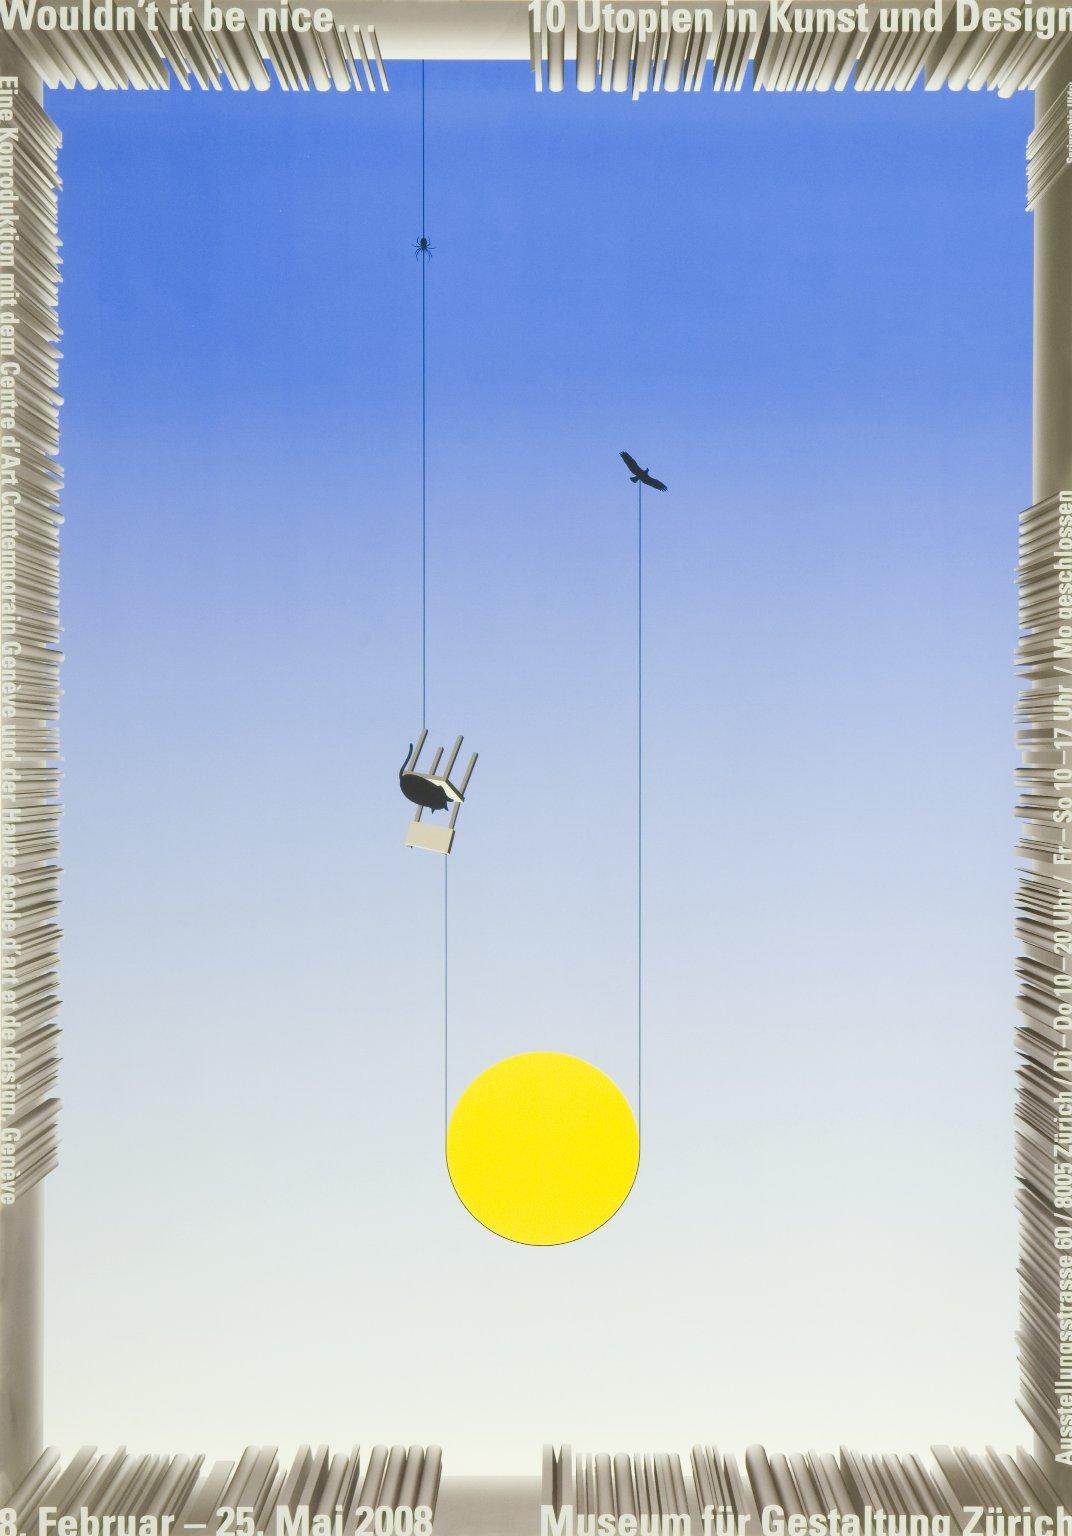 Wouldn't it be nice Utopien in Kunst und Design